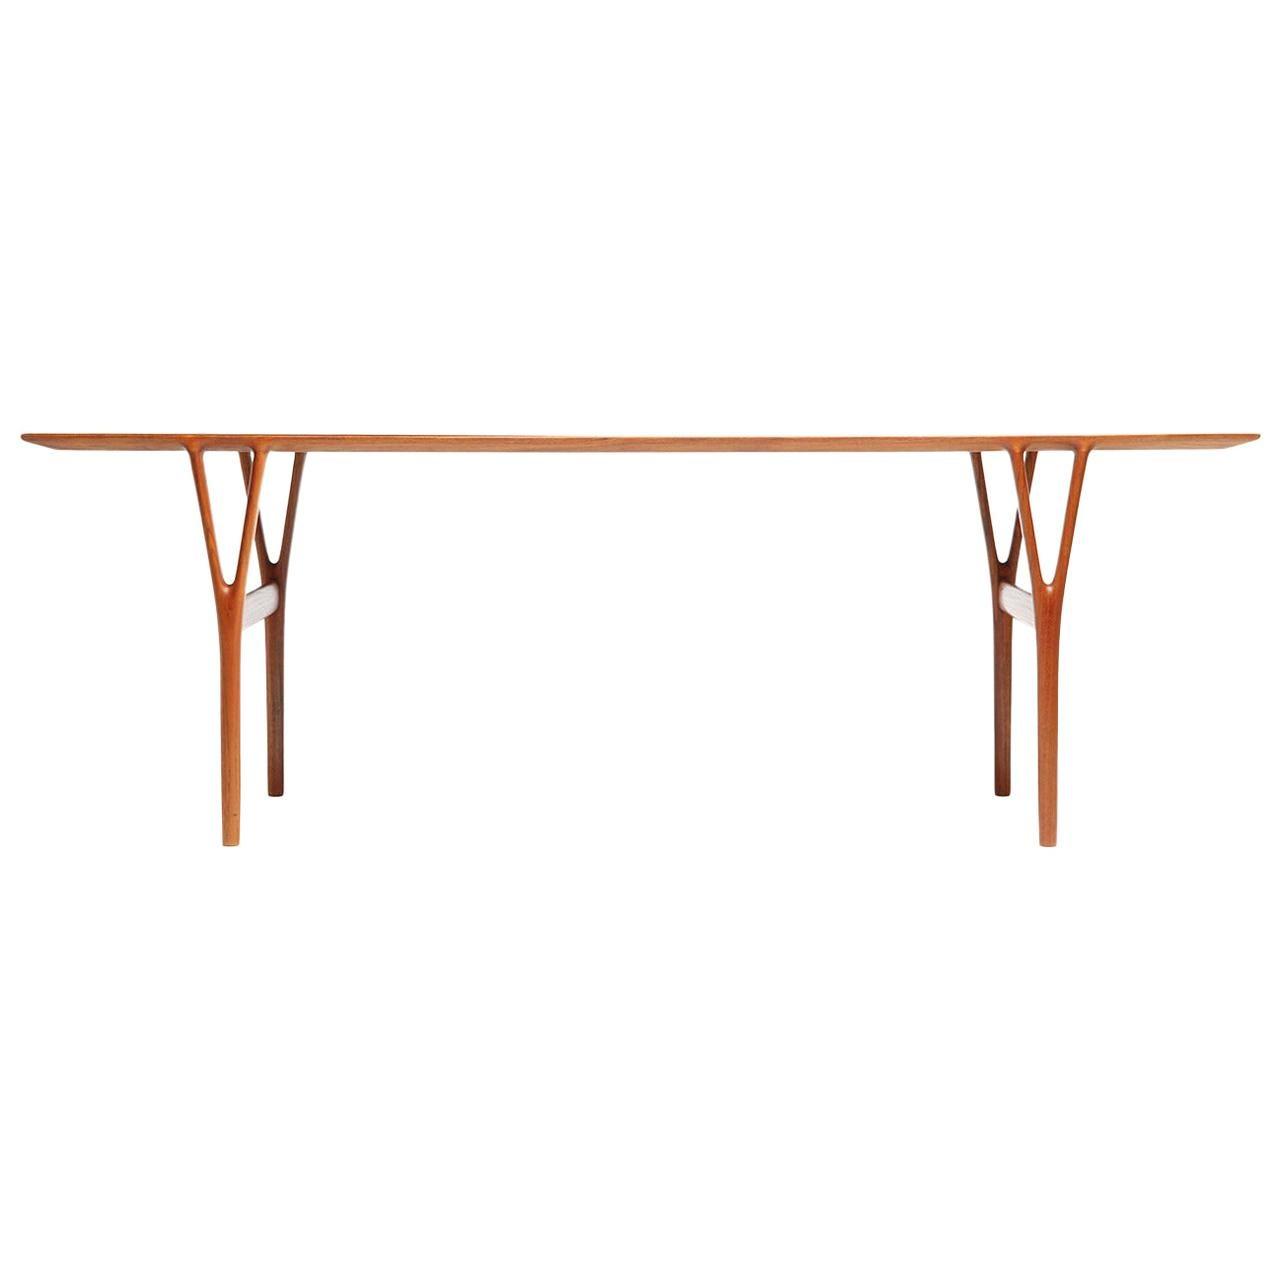 Low Table by Helge Vestergaard-Jensen for Peder Pedersen